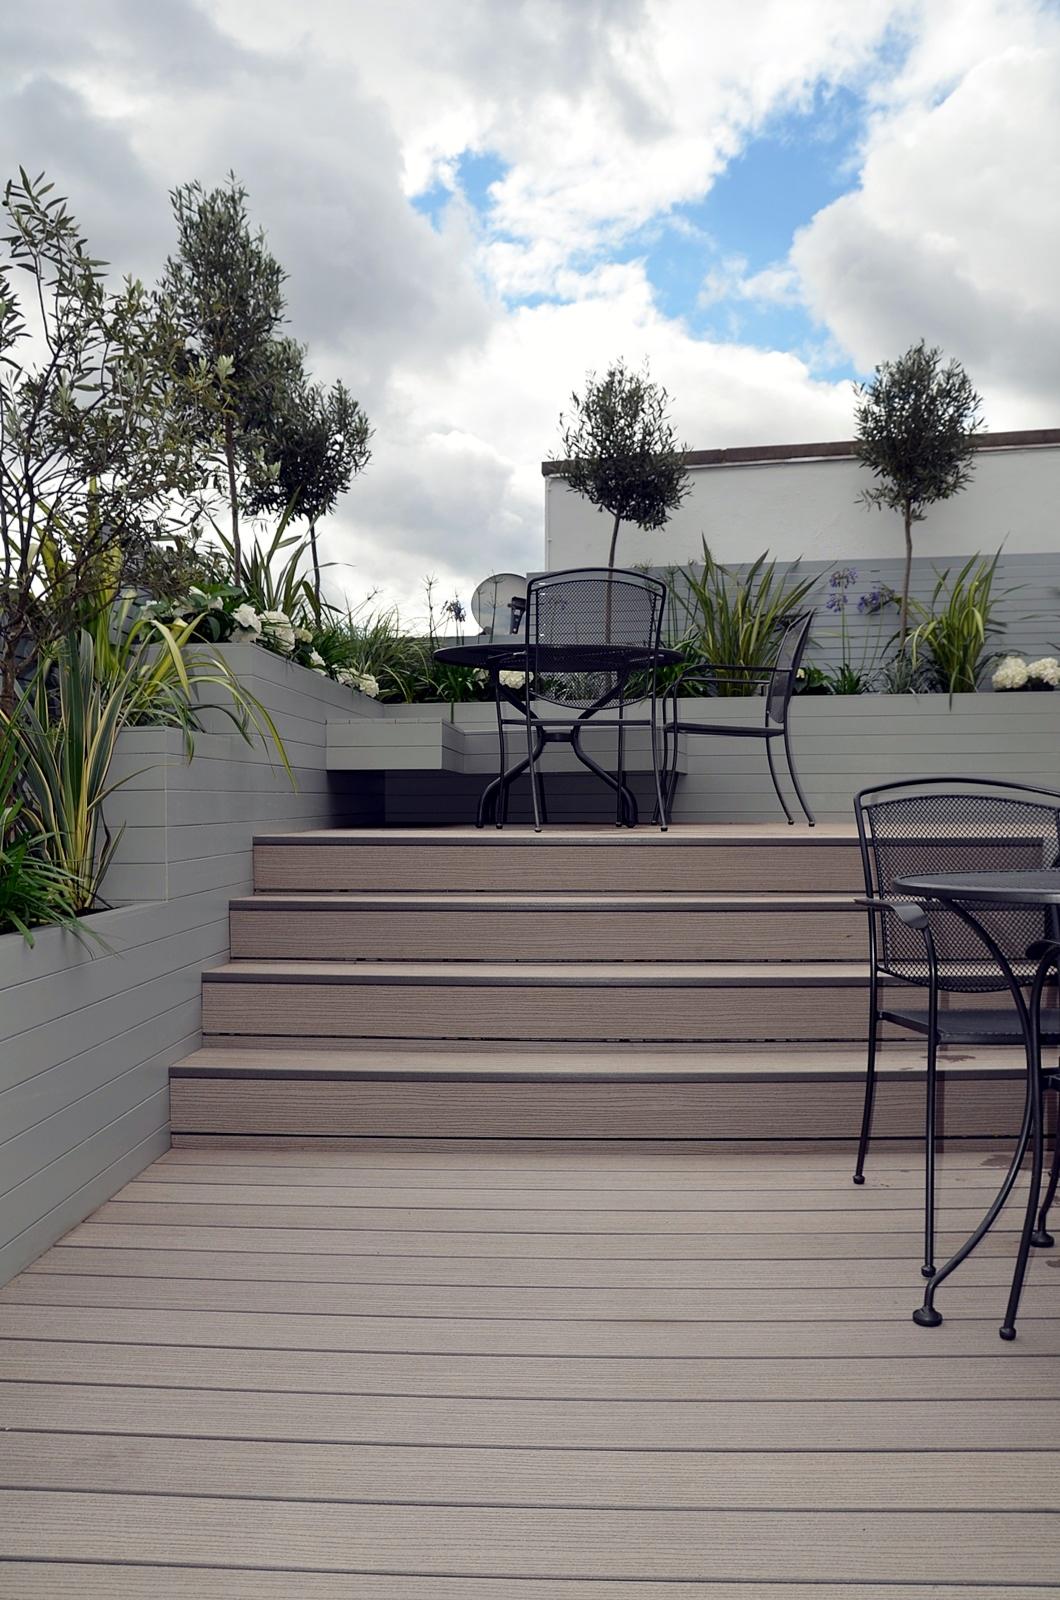 penthouse roof terrace garden design tower bridge docklands london